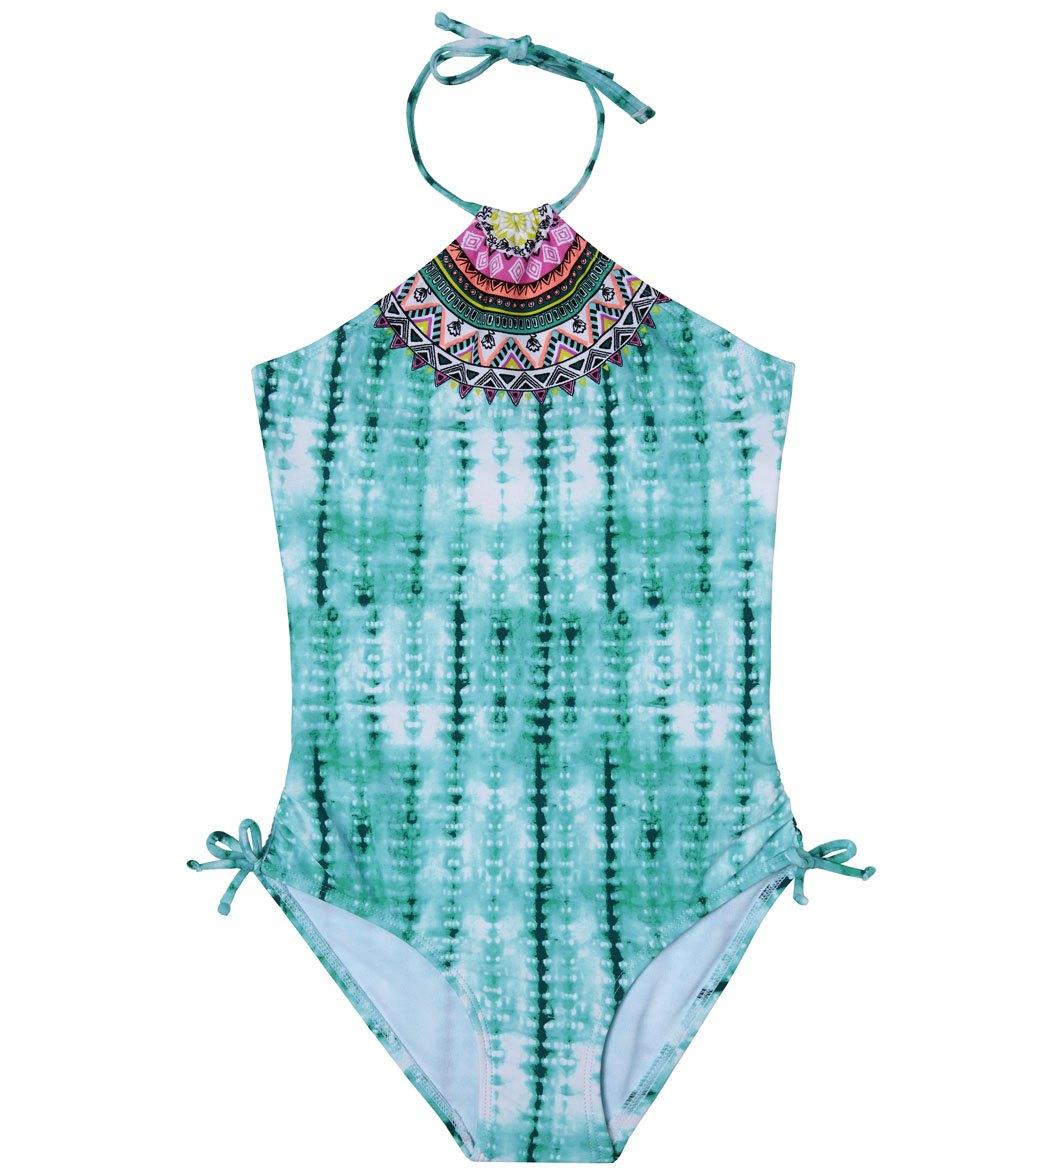 ea320edf5a822 Gossip Girls' Desert Rose One Piece Swimsuit (Big Kid) at SwimOutlet ...